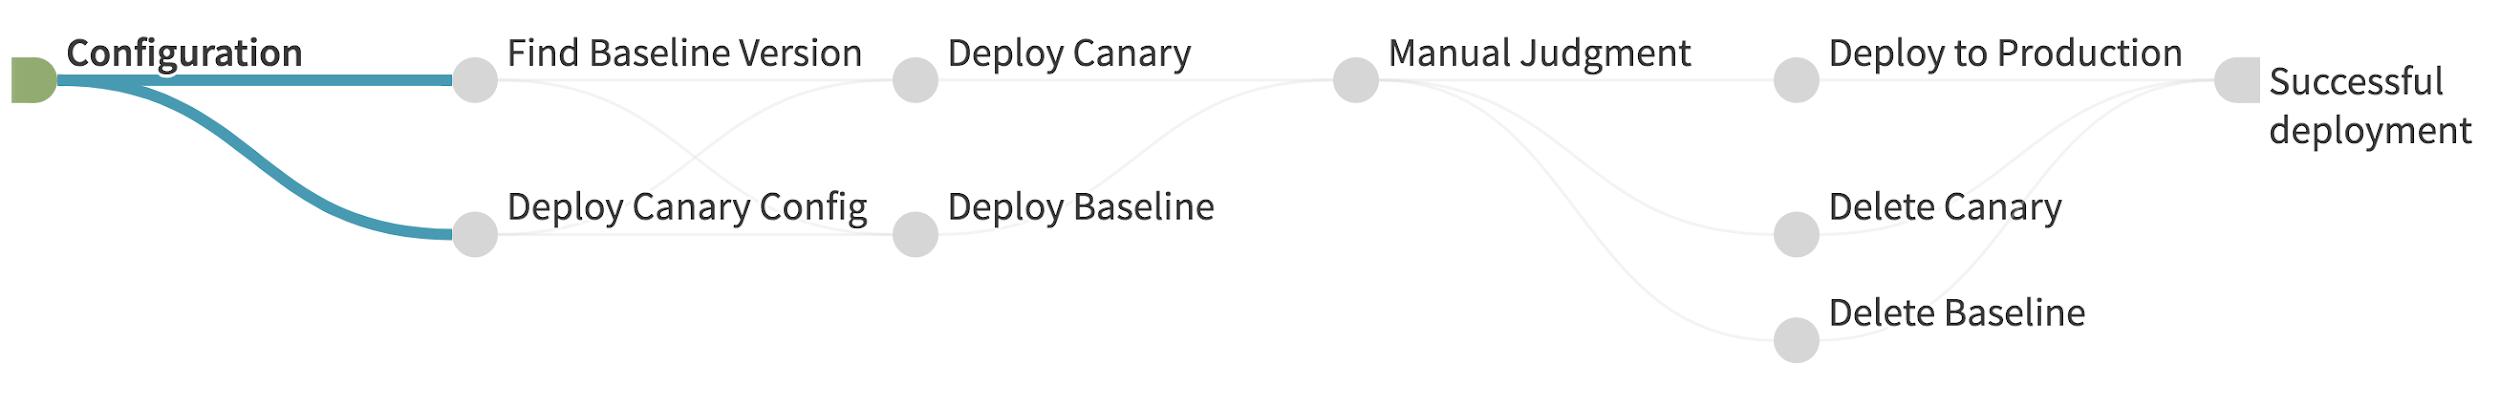 Canary 部署流水线的阶段图示